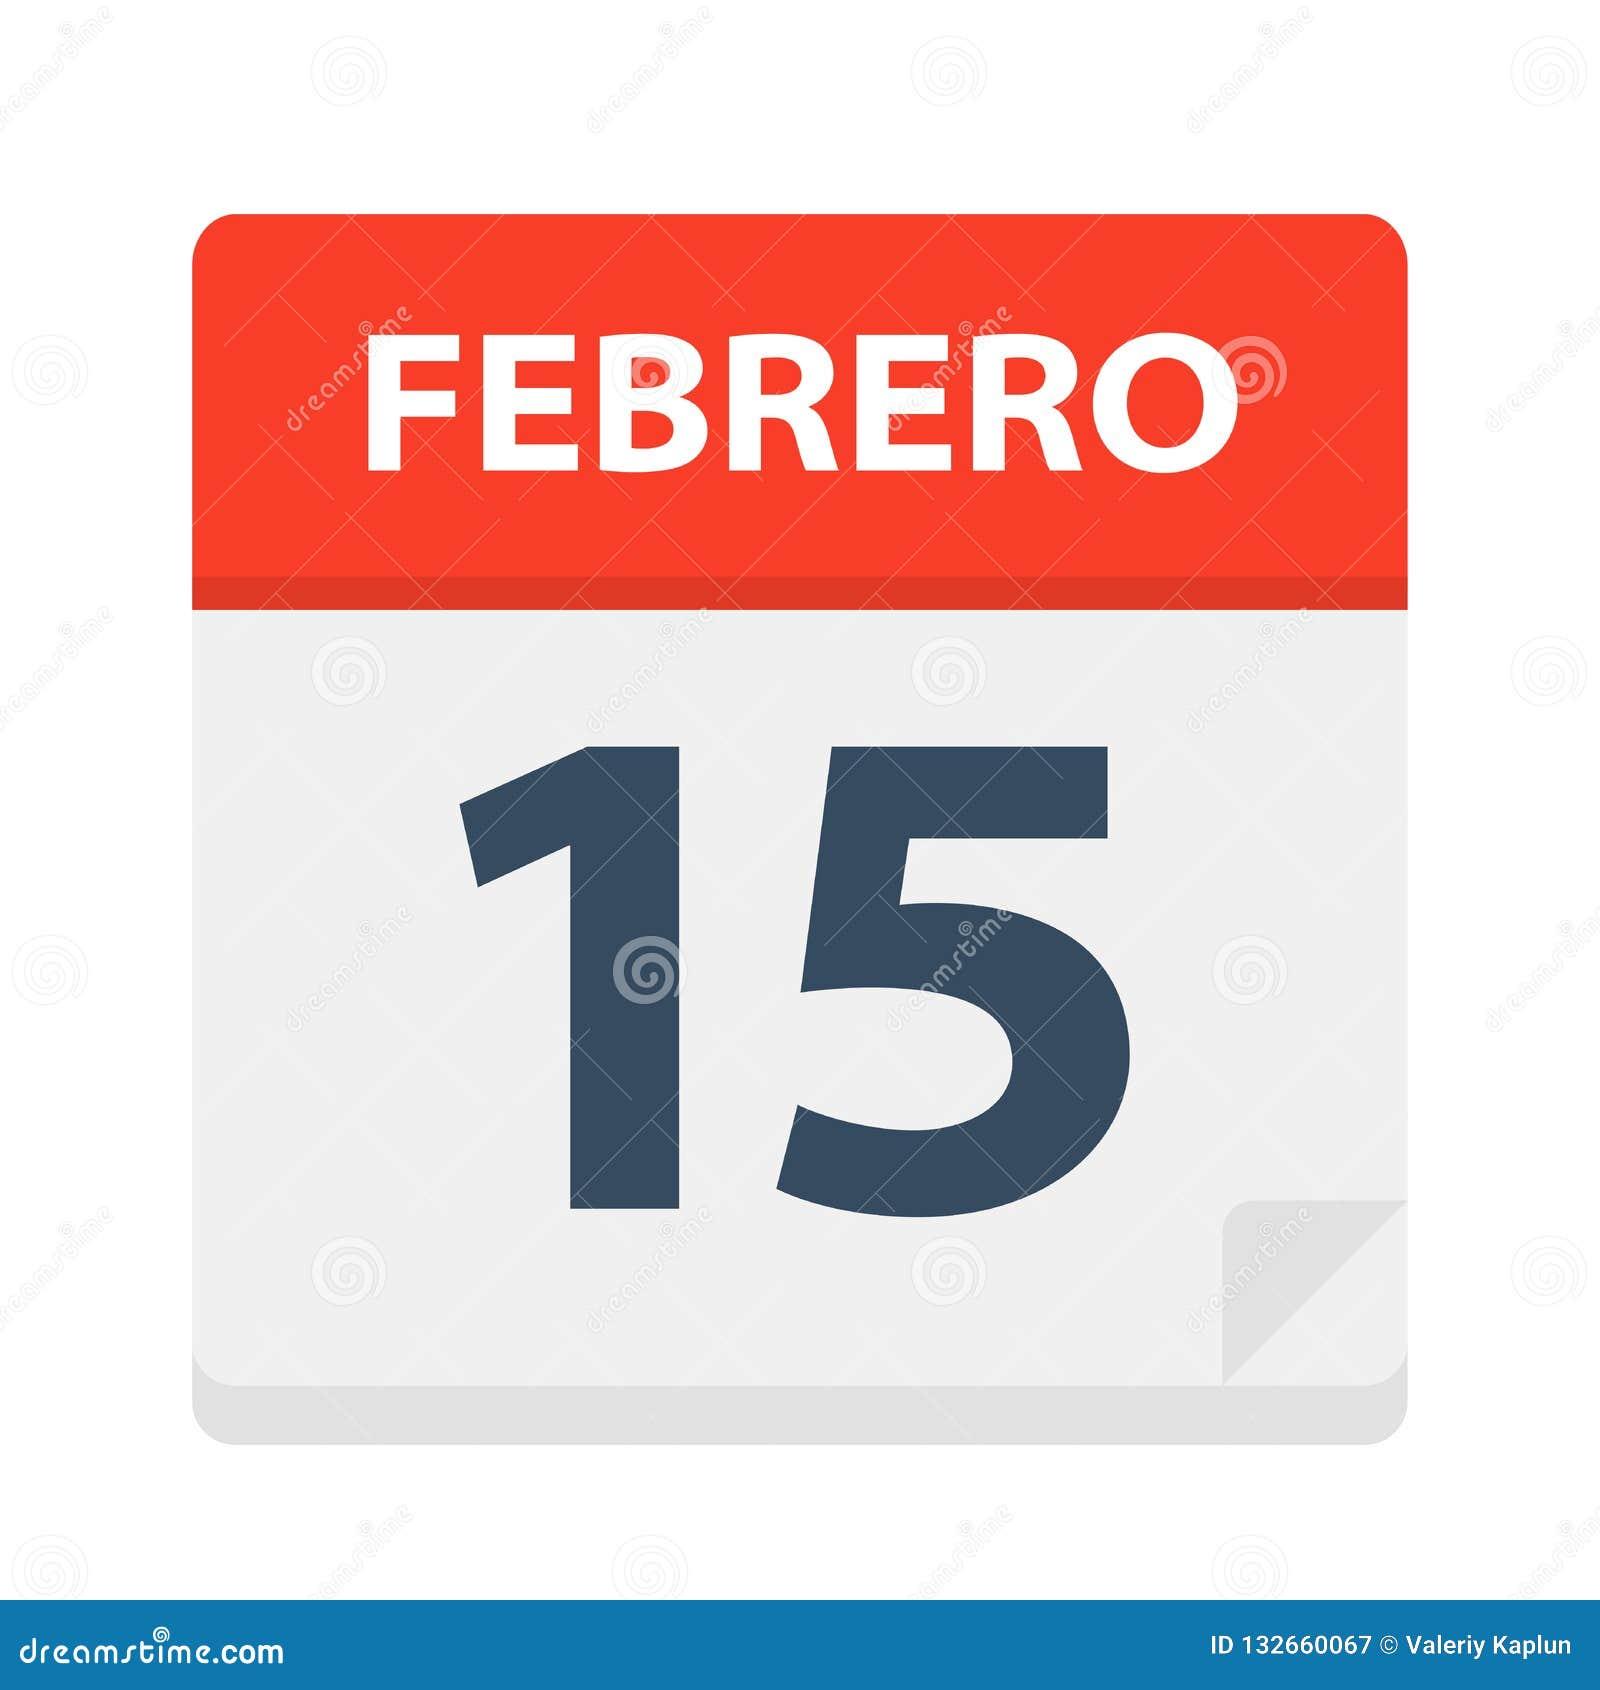 February 15 2019 Calendar Febrero 15   Calendar Icon   February 15. Vector Illustration Of